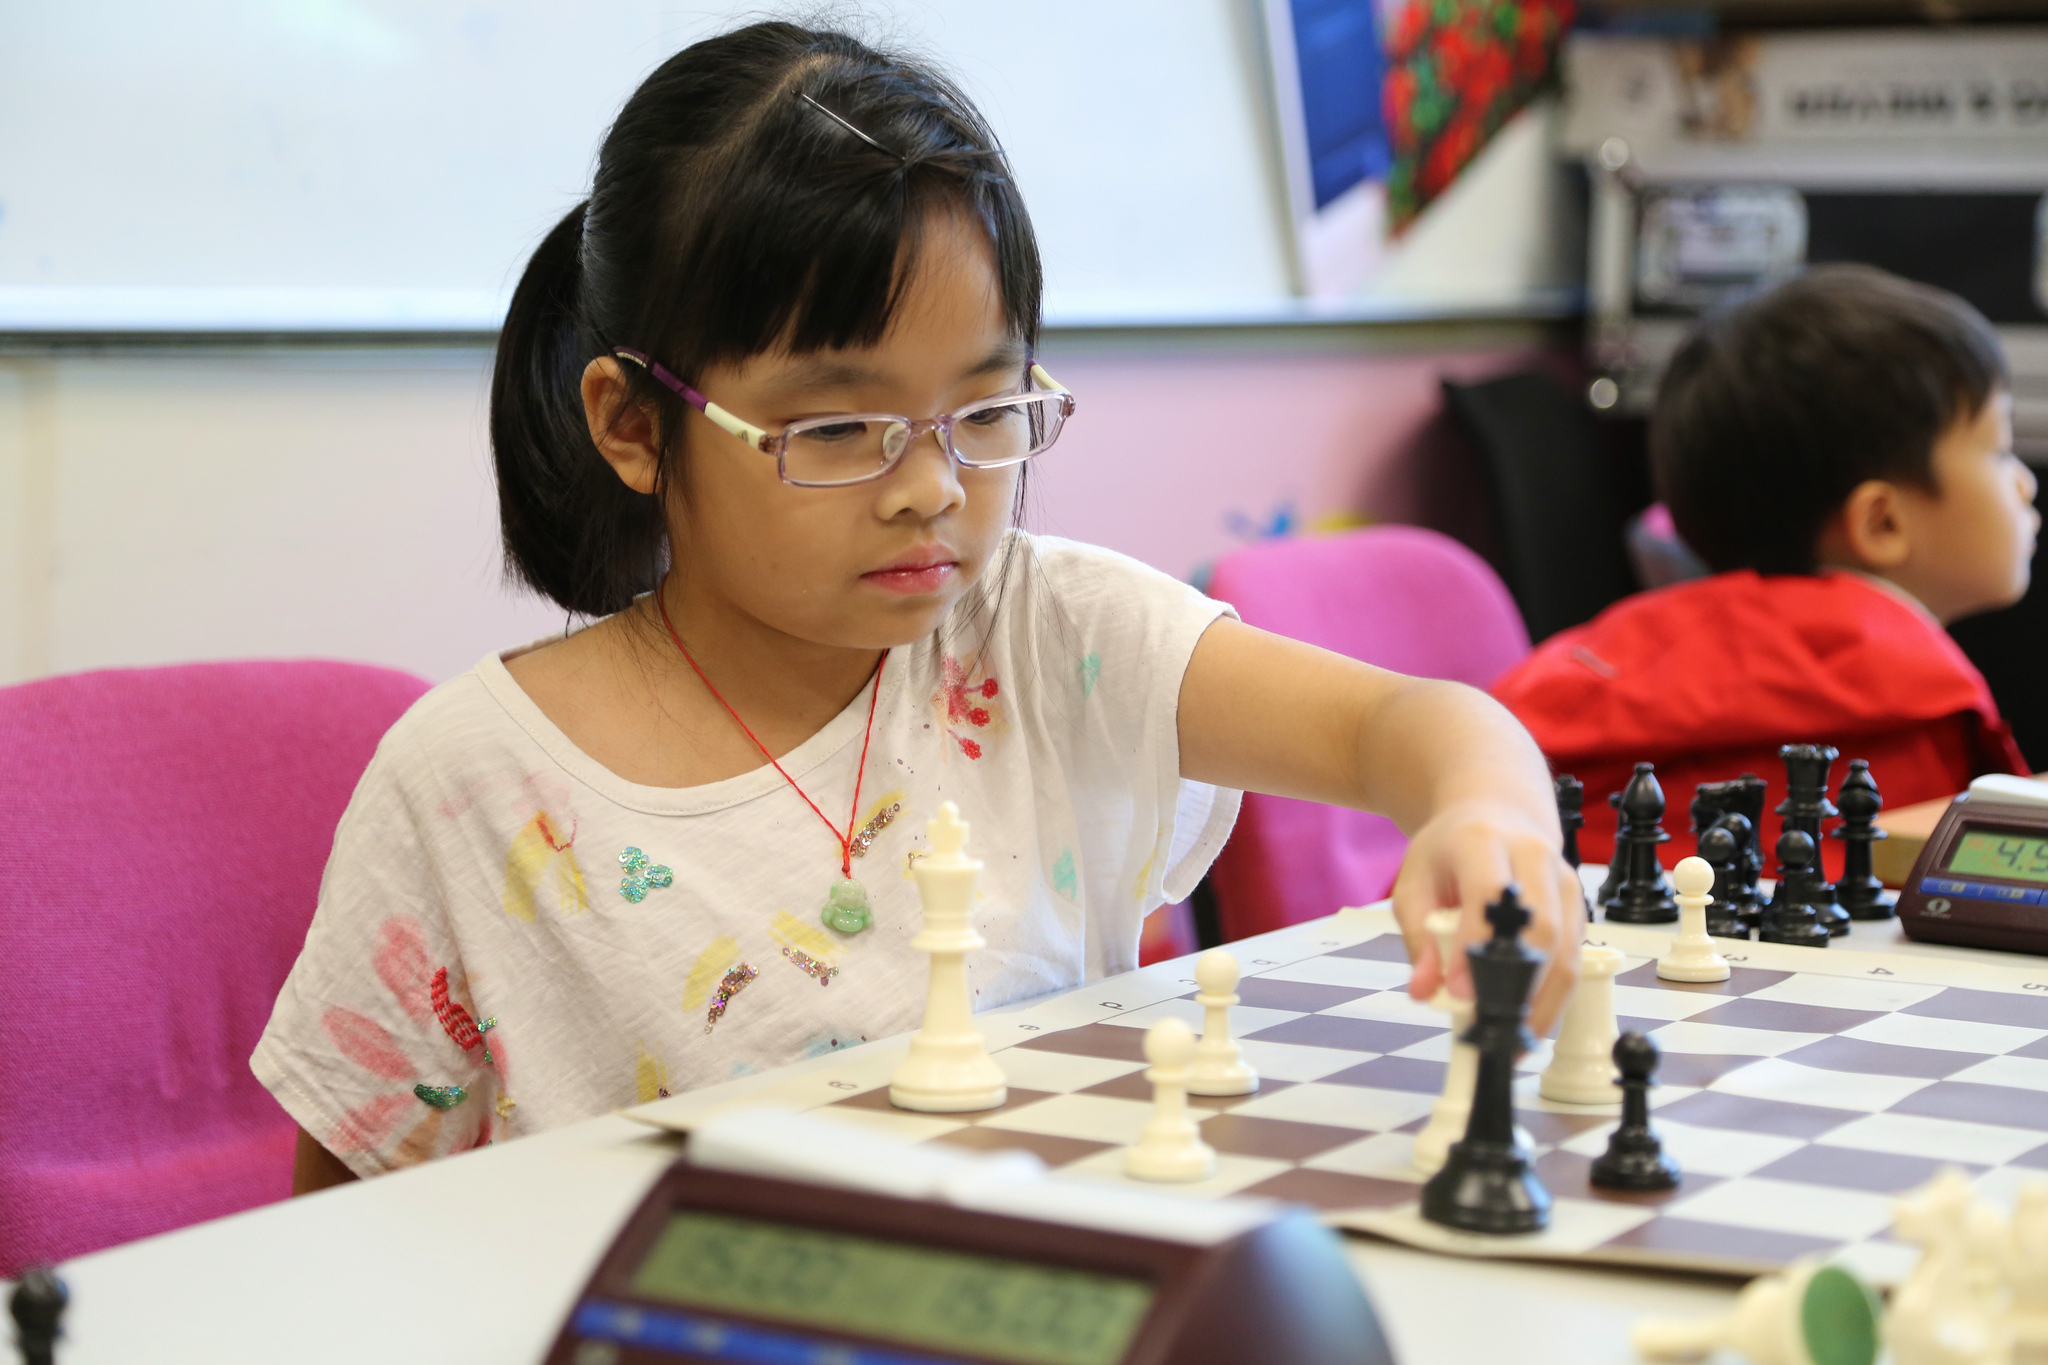 Michelle Chan enjoying white pieces